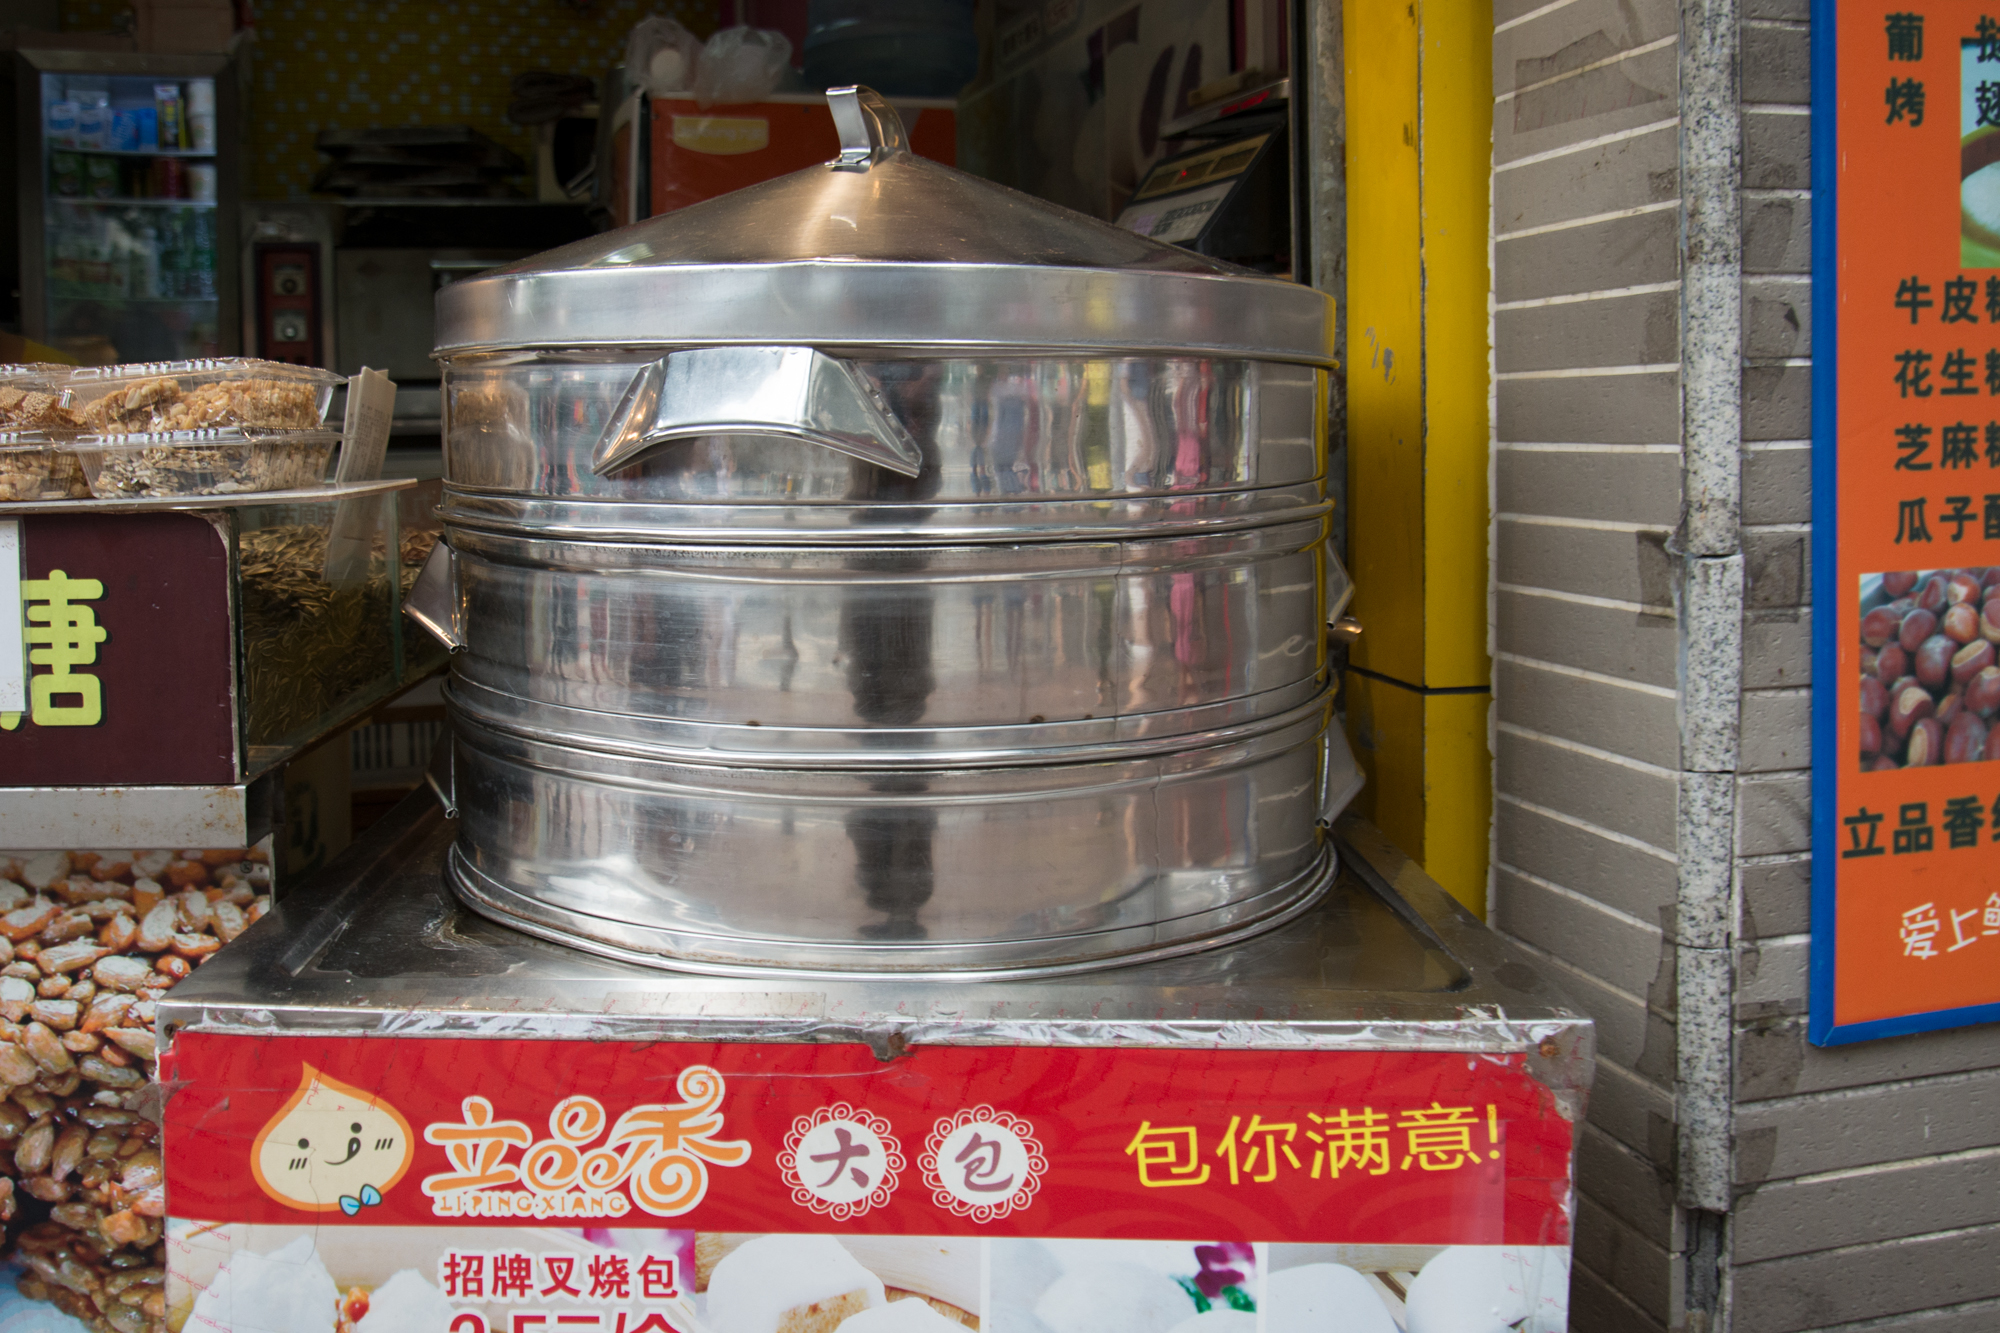 Dumpling Steamer